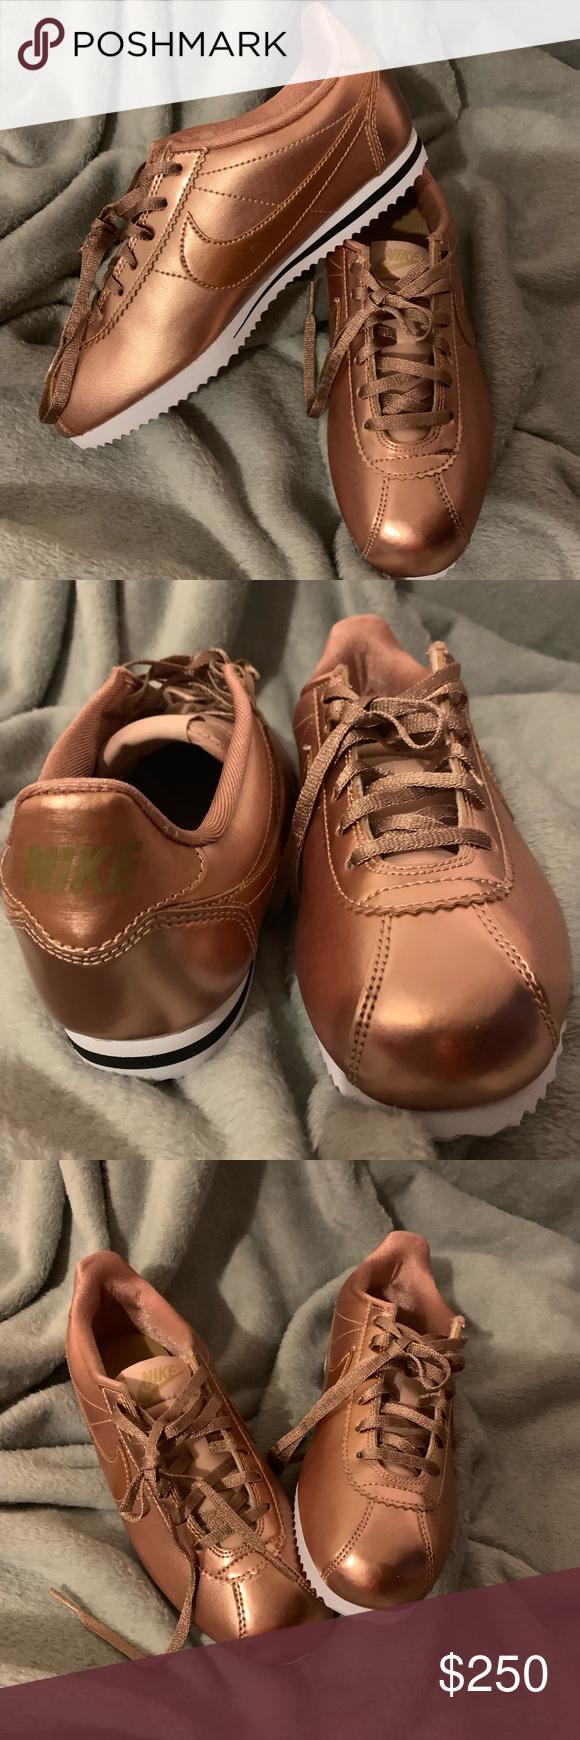 Nike Vintage Cortez In 2020 Vintage Nike Nike Shoes For Sale Nike Gold